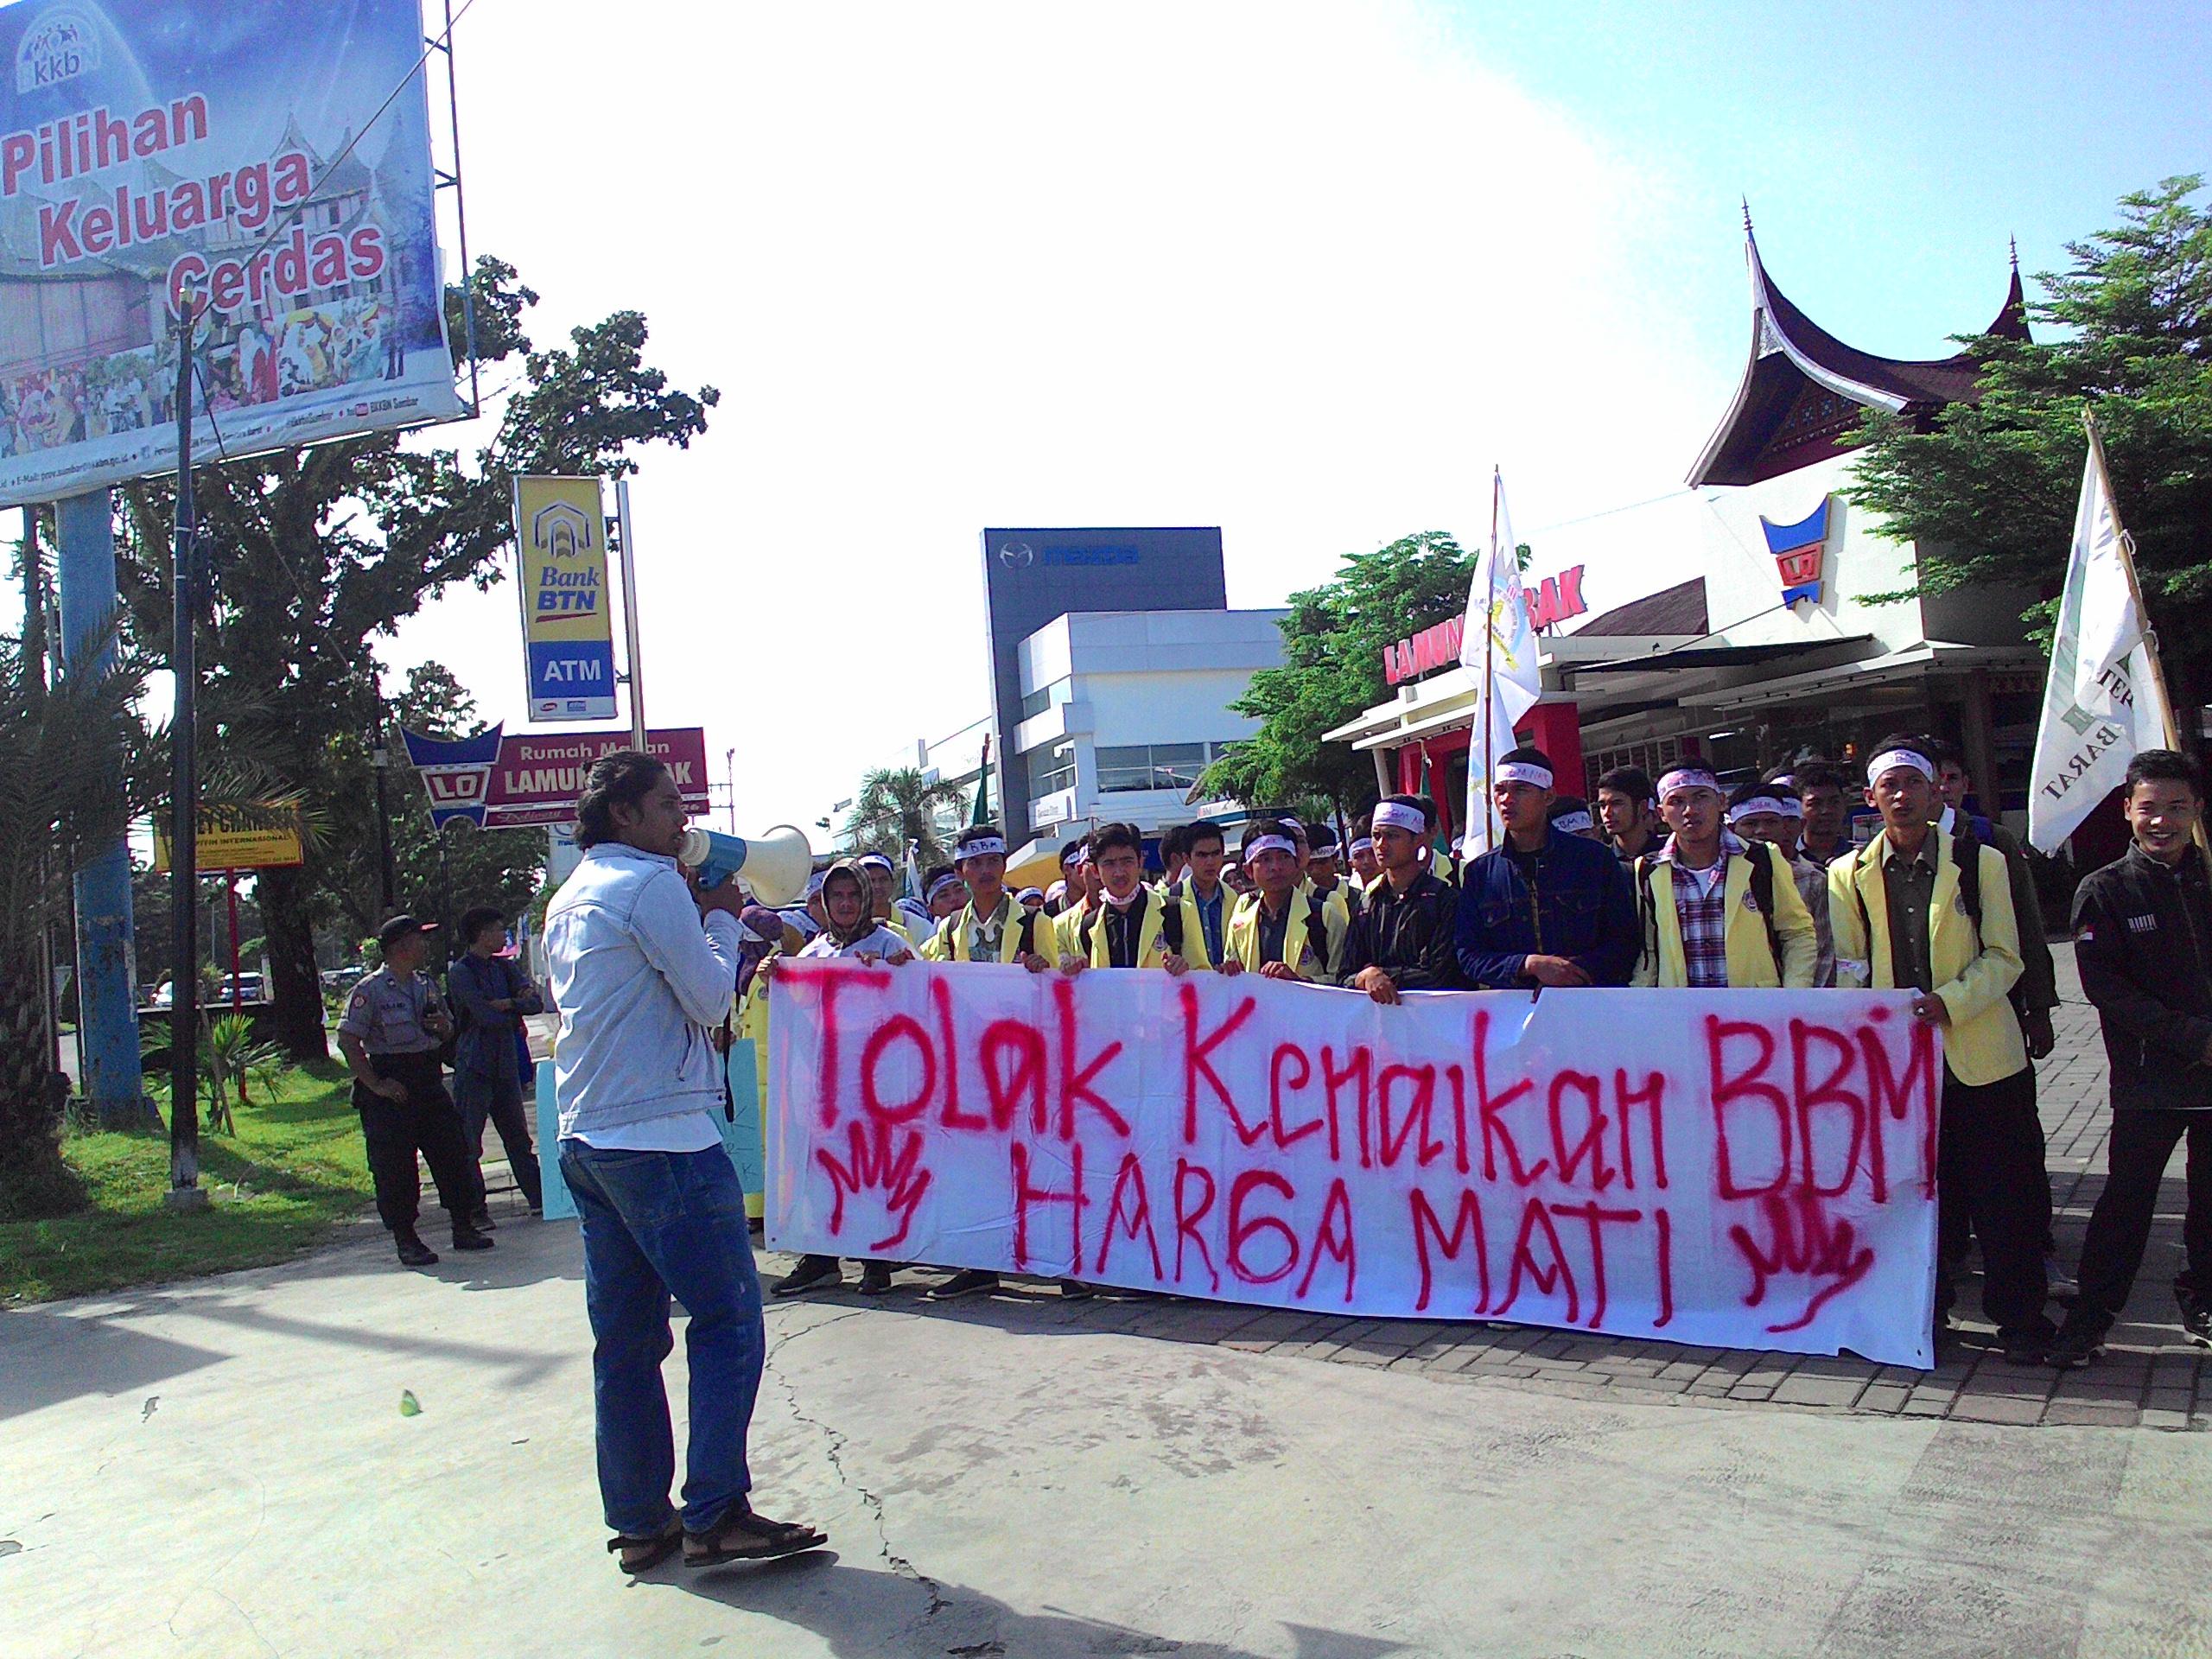 Unjuk rasa ratusan mahasiswa tolak kenaikan harga Bahan Bakar Minyak (BBM). Foto : RadioSushiFM